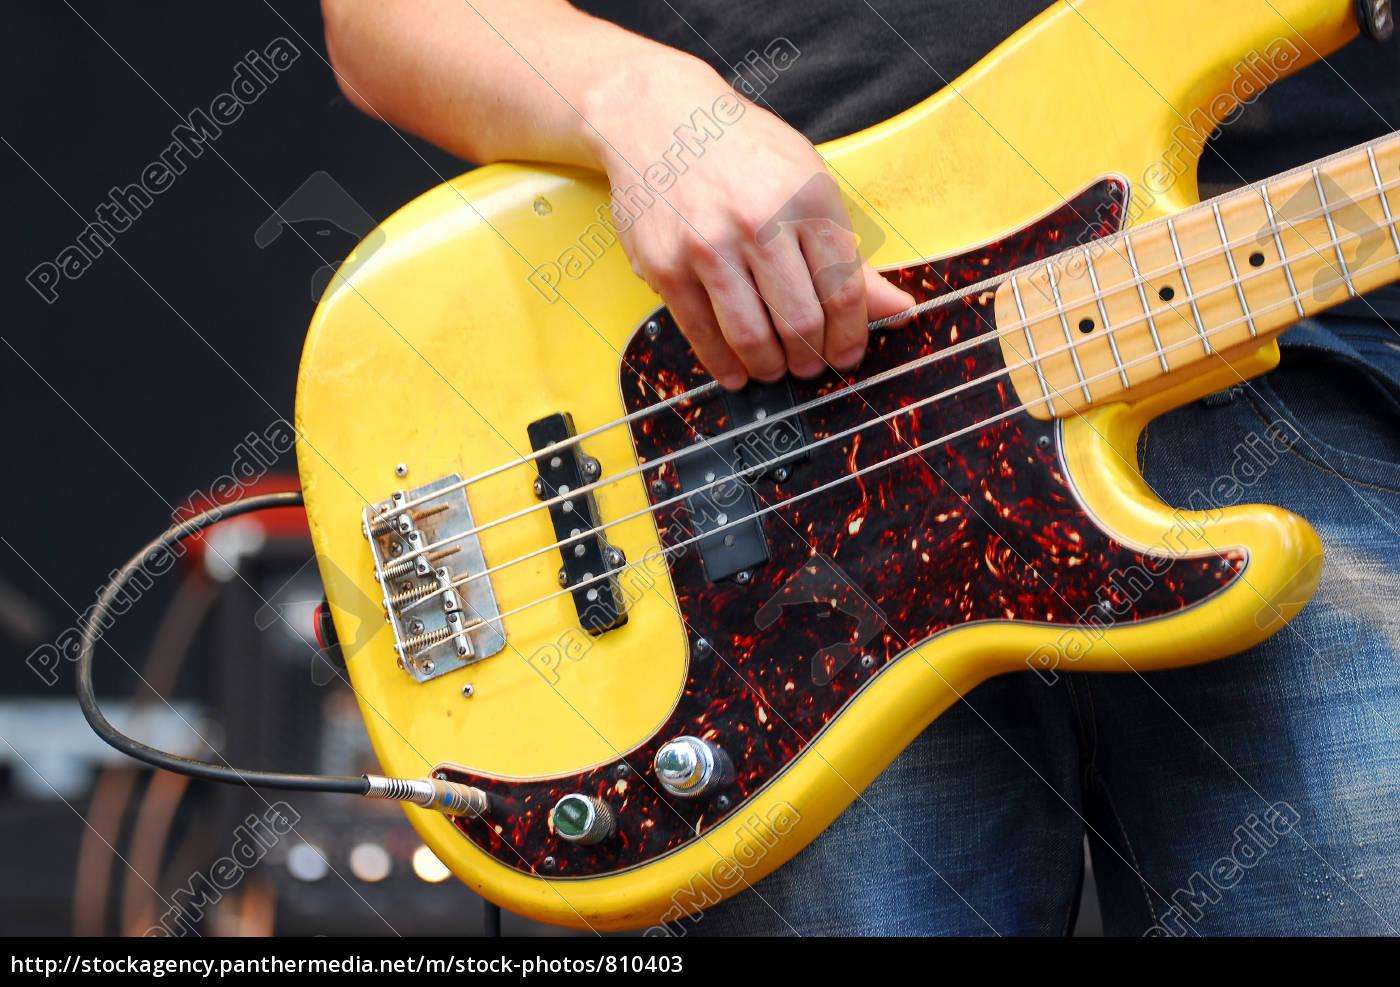 yellow, guitar - 810403